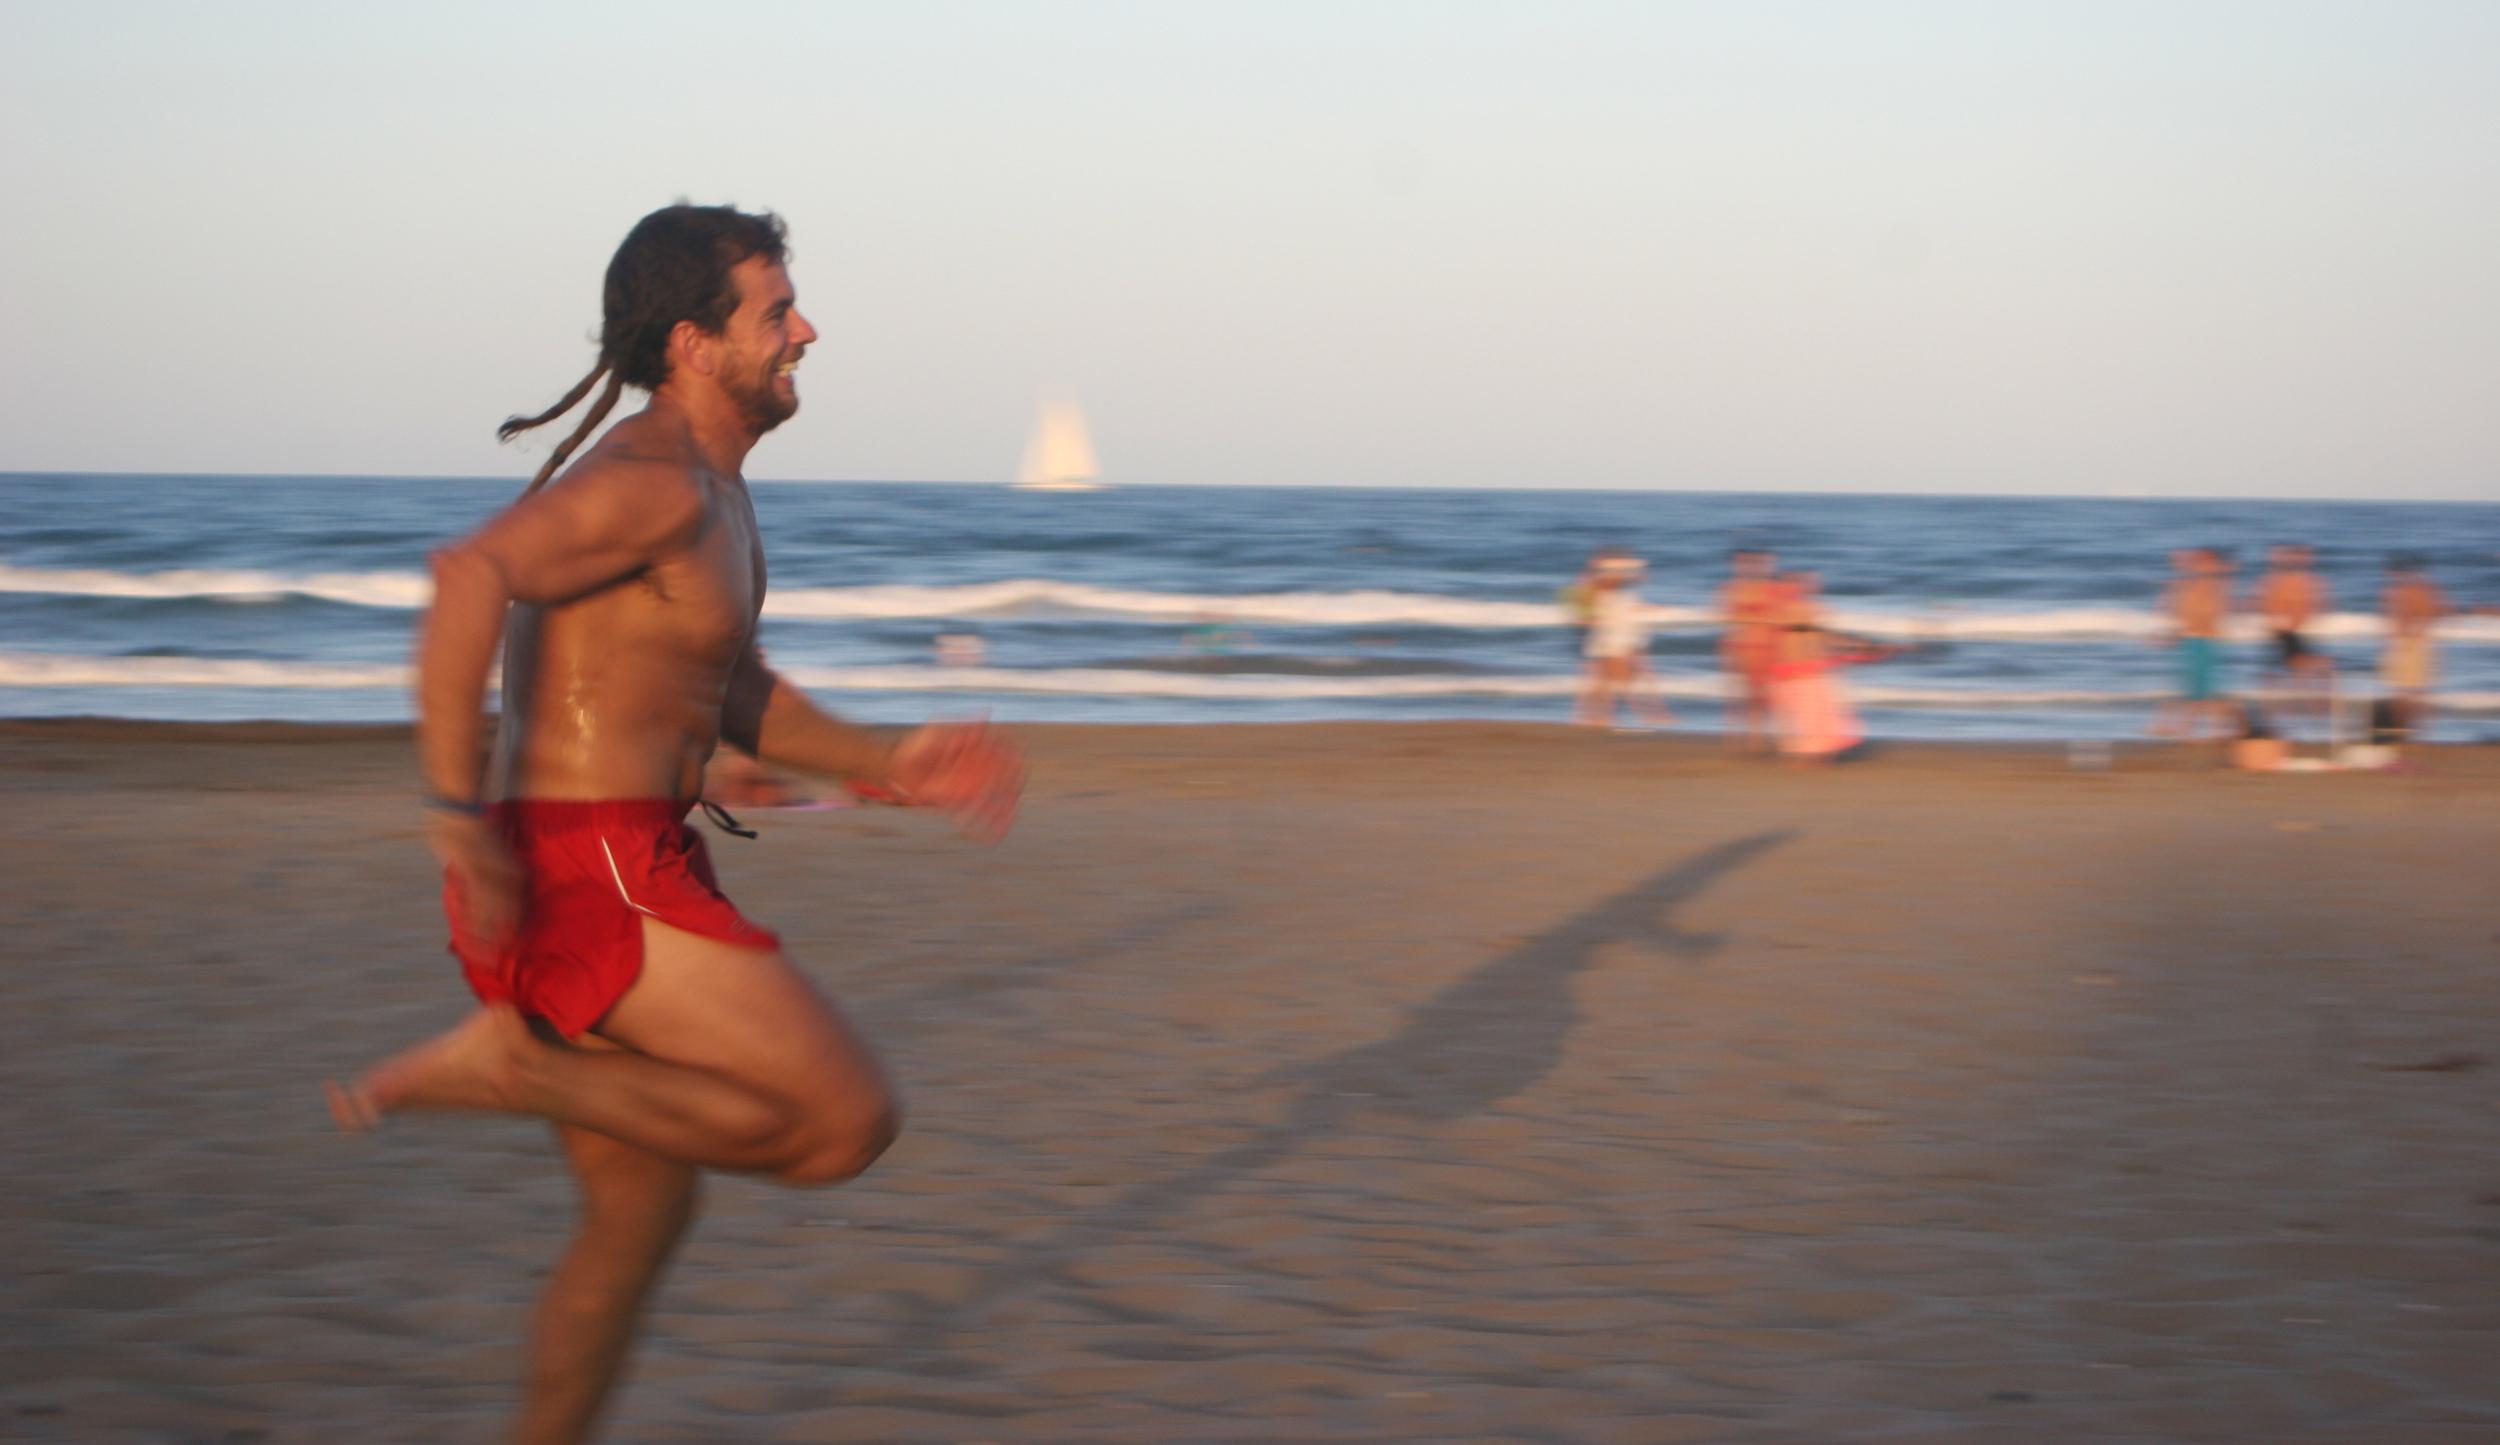 Full_CrossFit_Beach_Wod_V2_2015-14.jpg